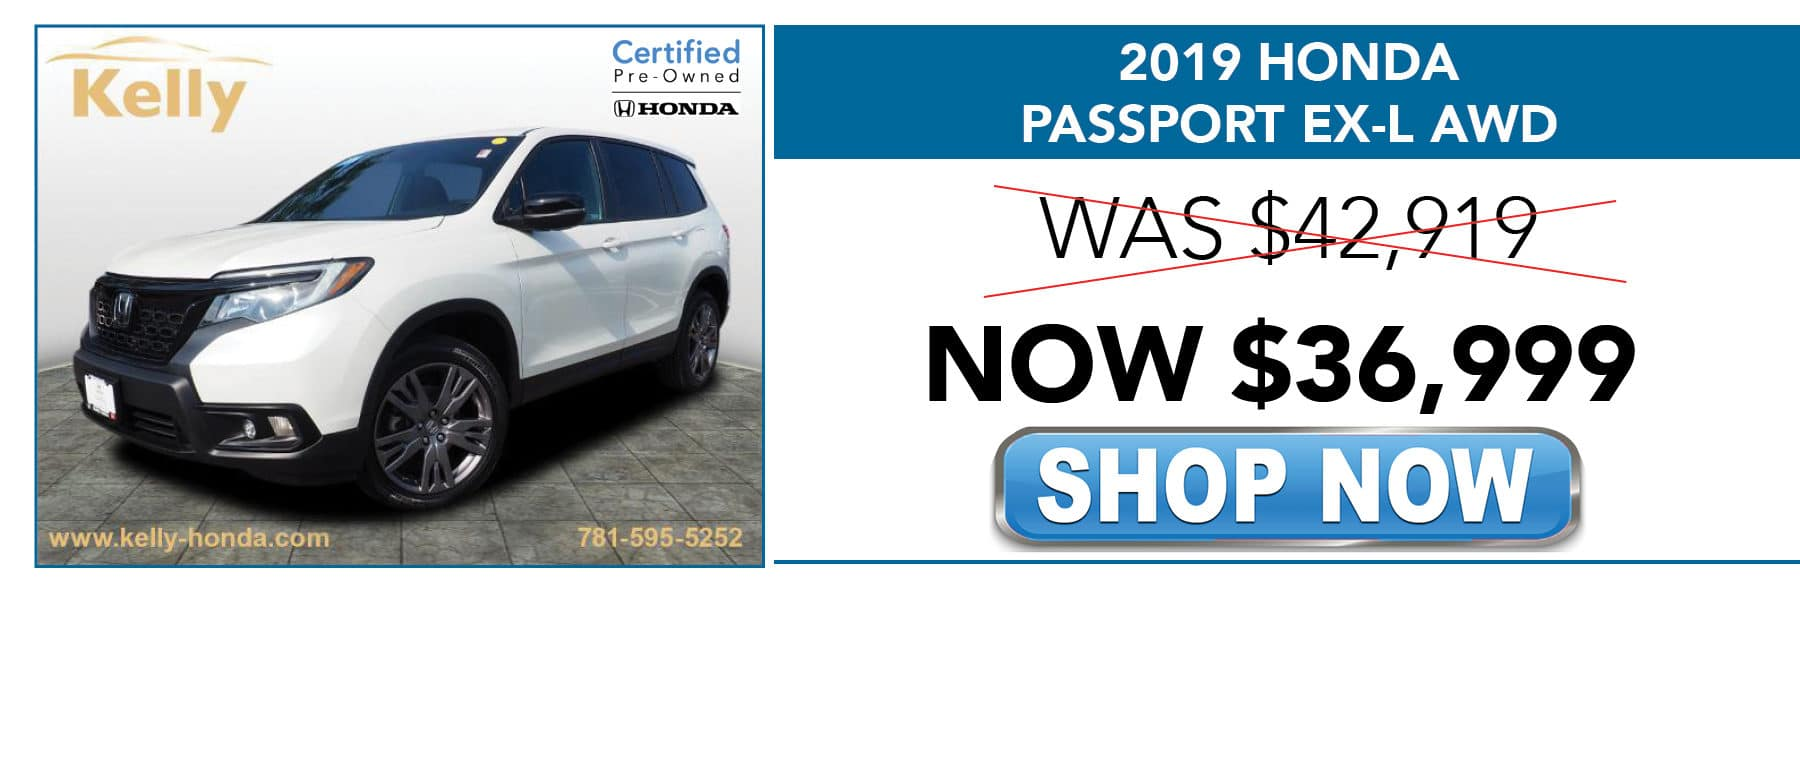 2019 Honda Passport EX-L SUV Now $36,999